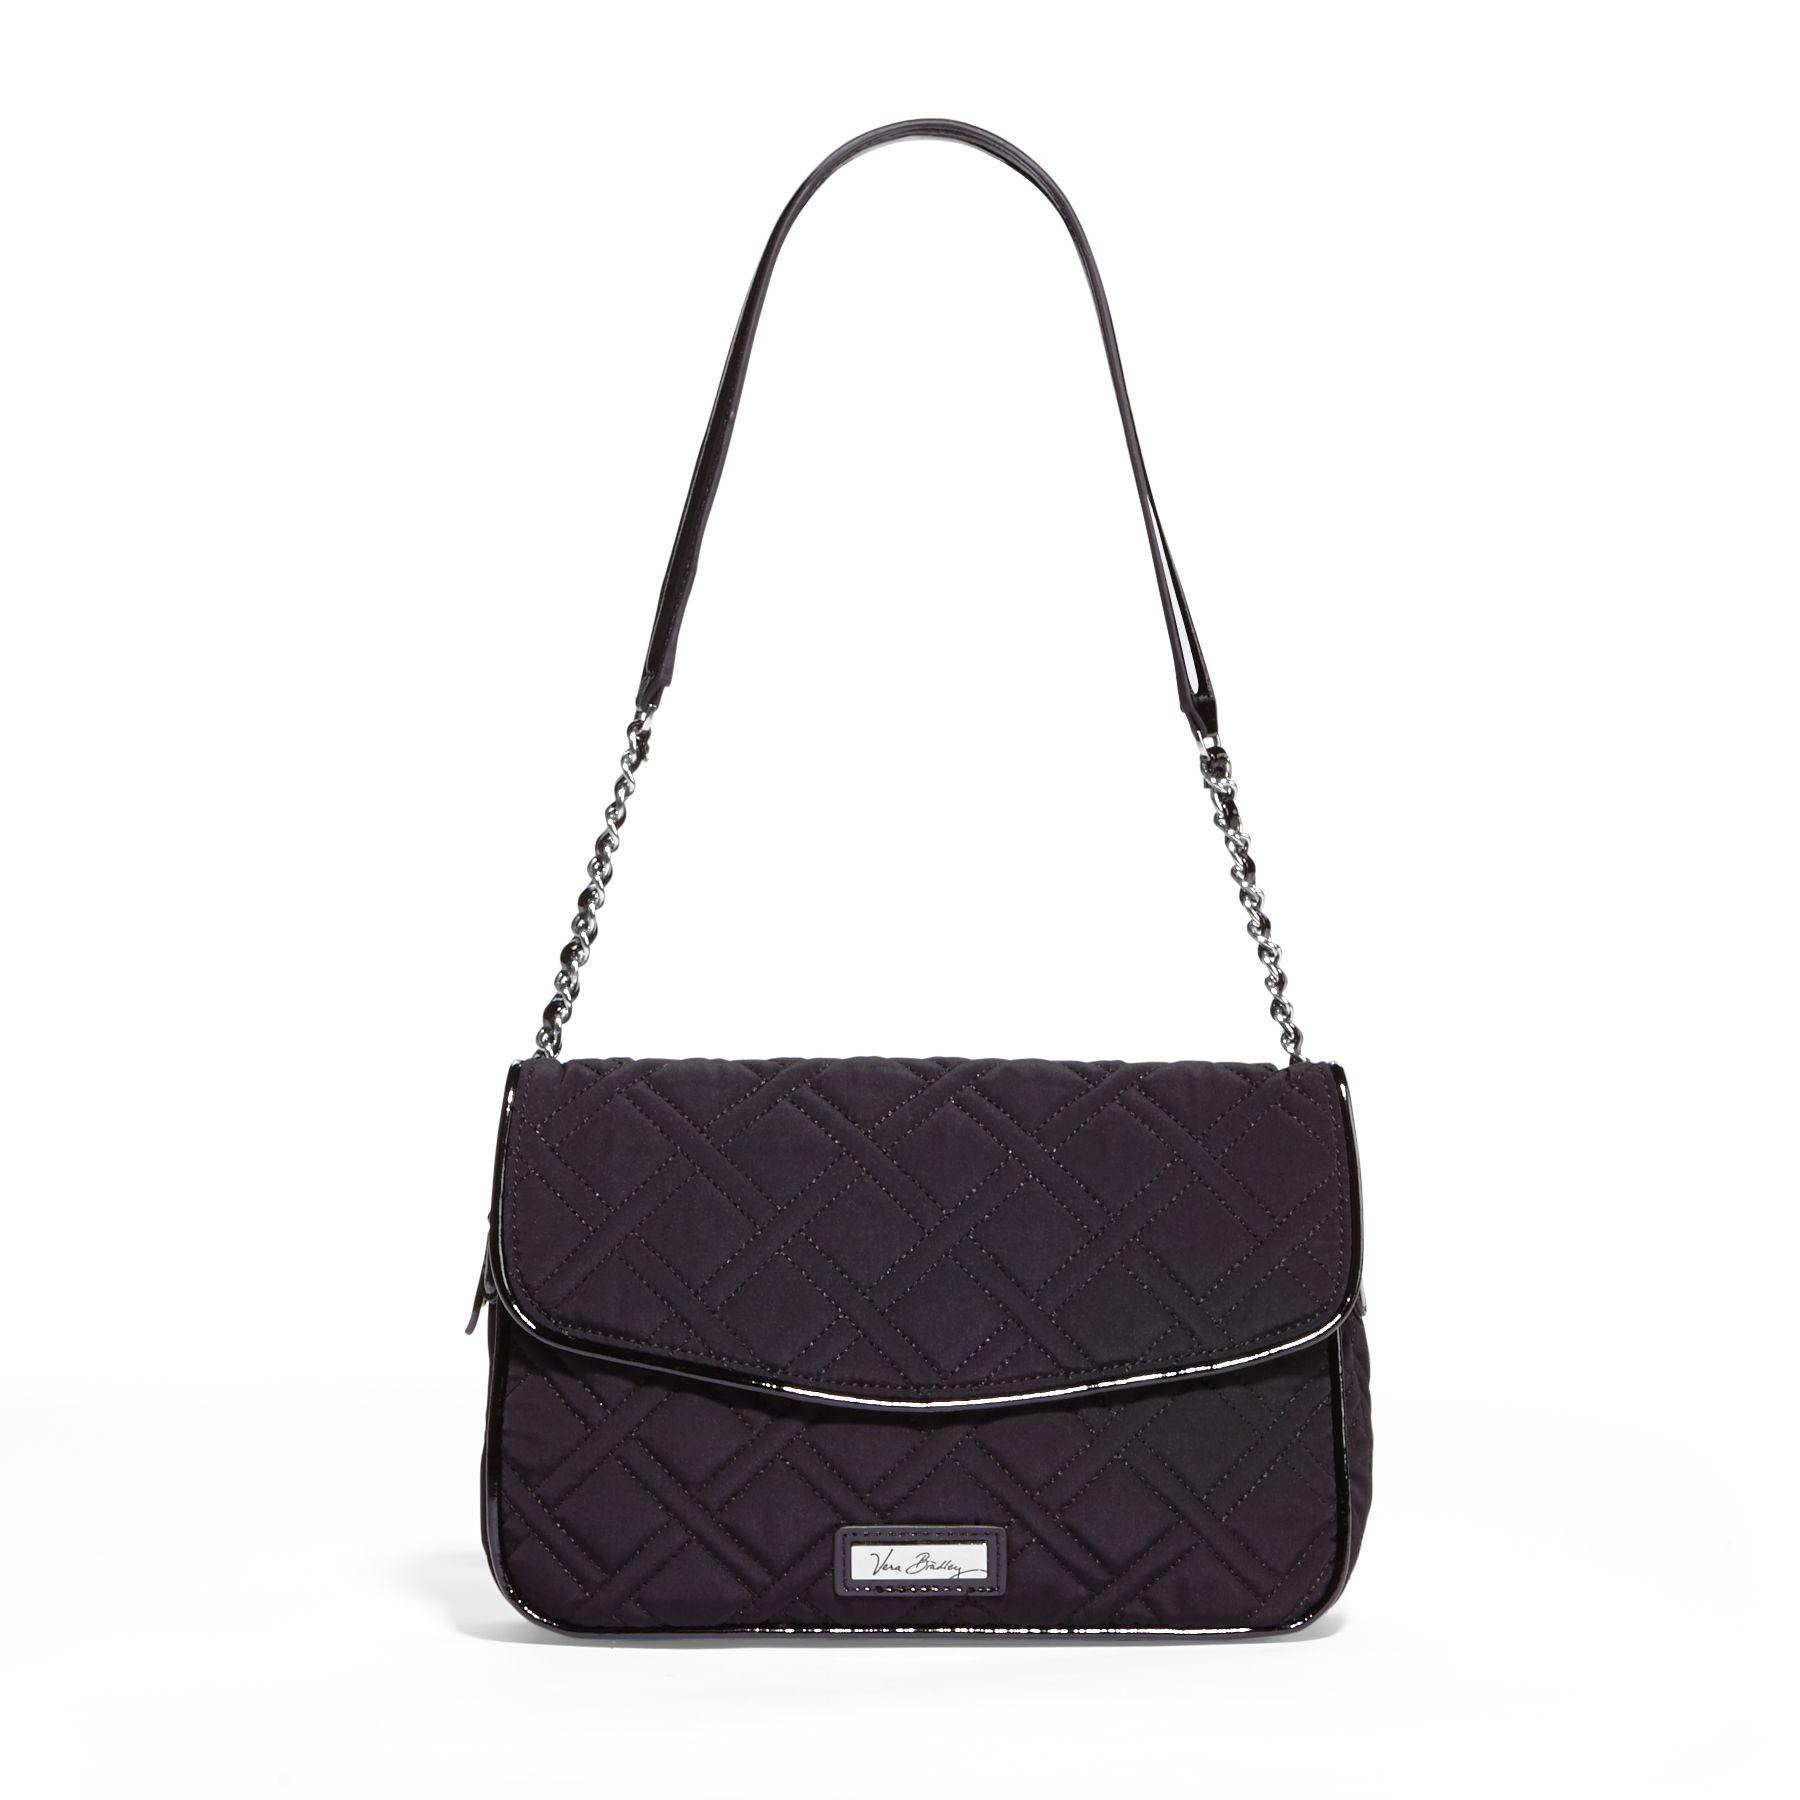 Vera Bradley Chain Shoulder Bag in Classic Black